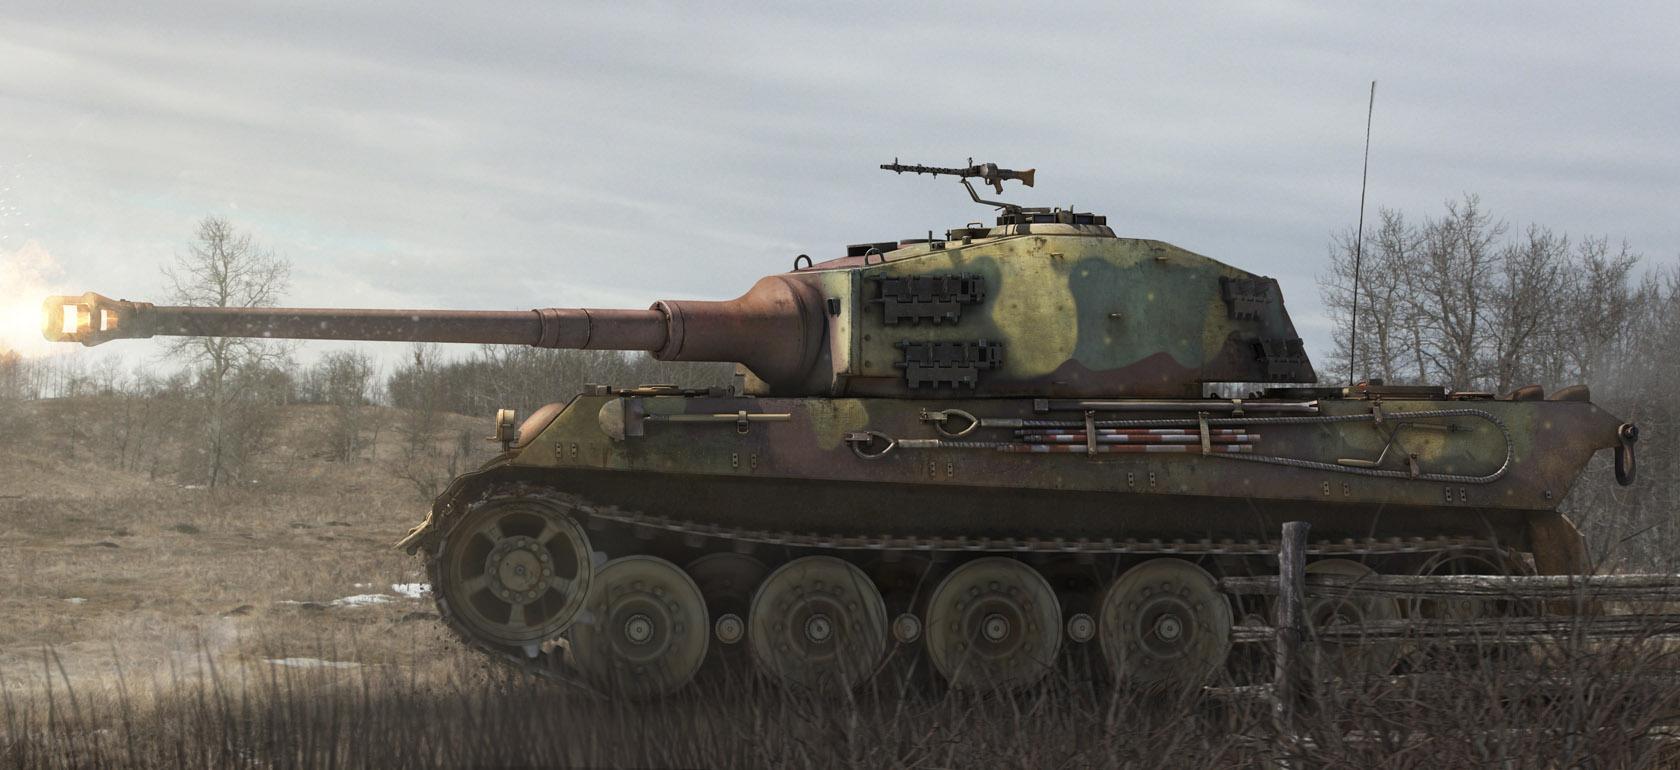 рисунок Pz.Kpfw. VI Ausf. B Tiger II